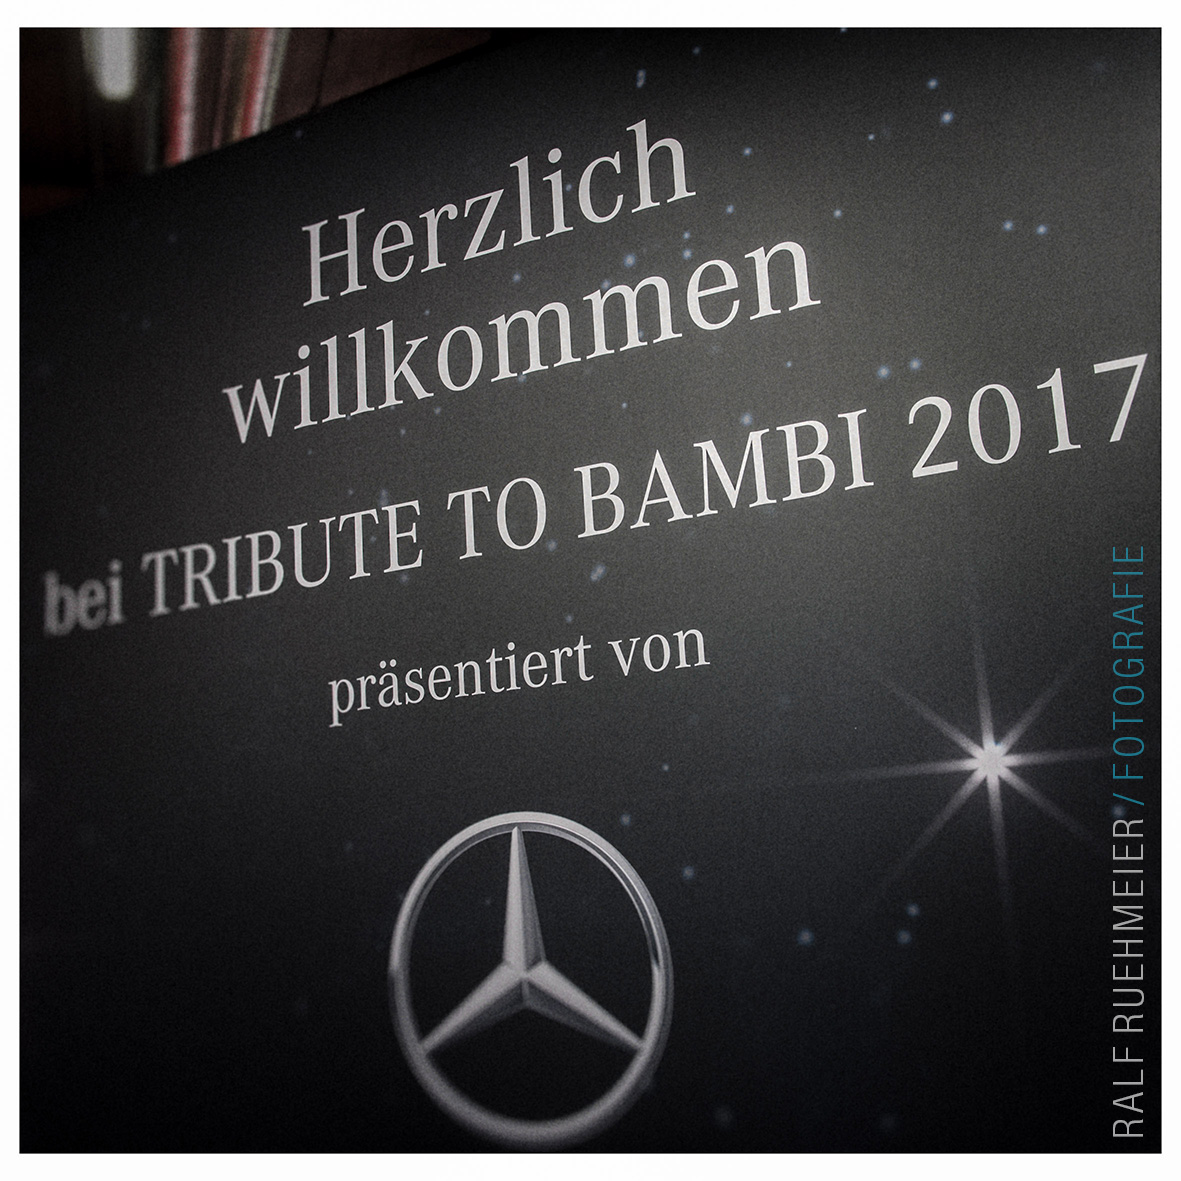 Event Bambi Tribute To Bambi fotografie berlin